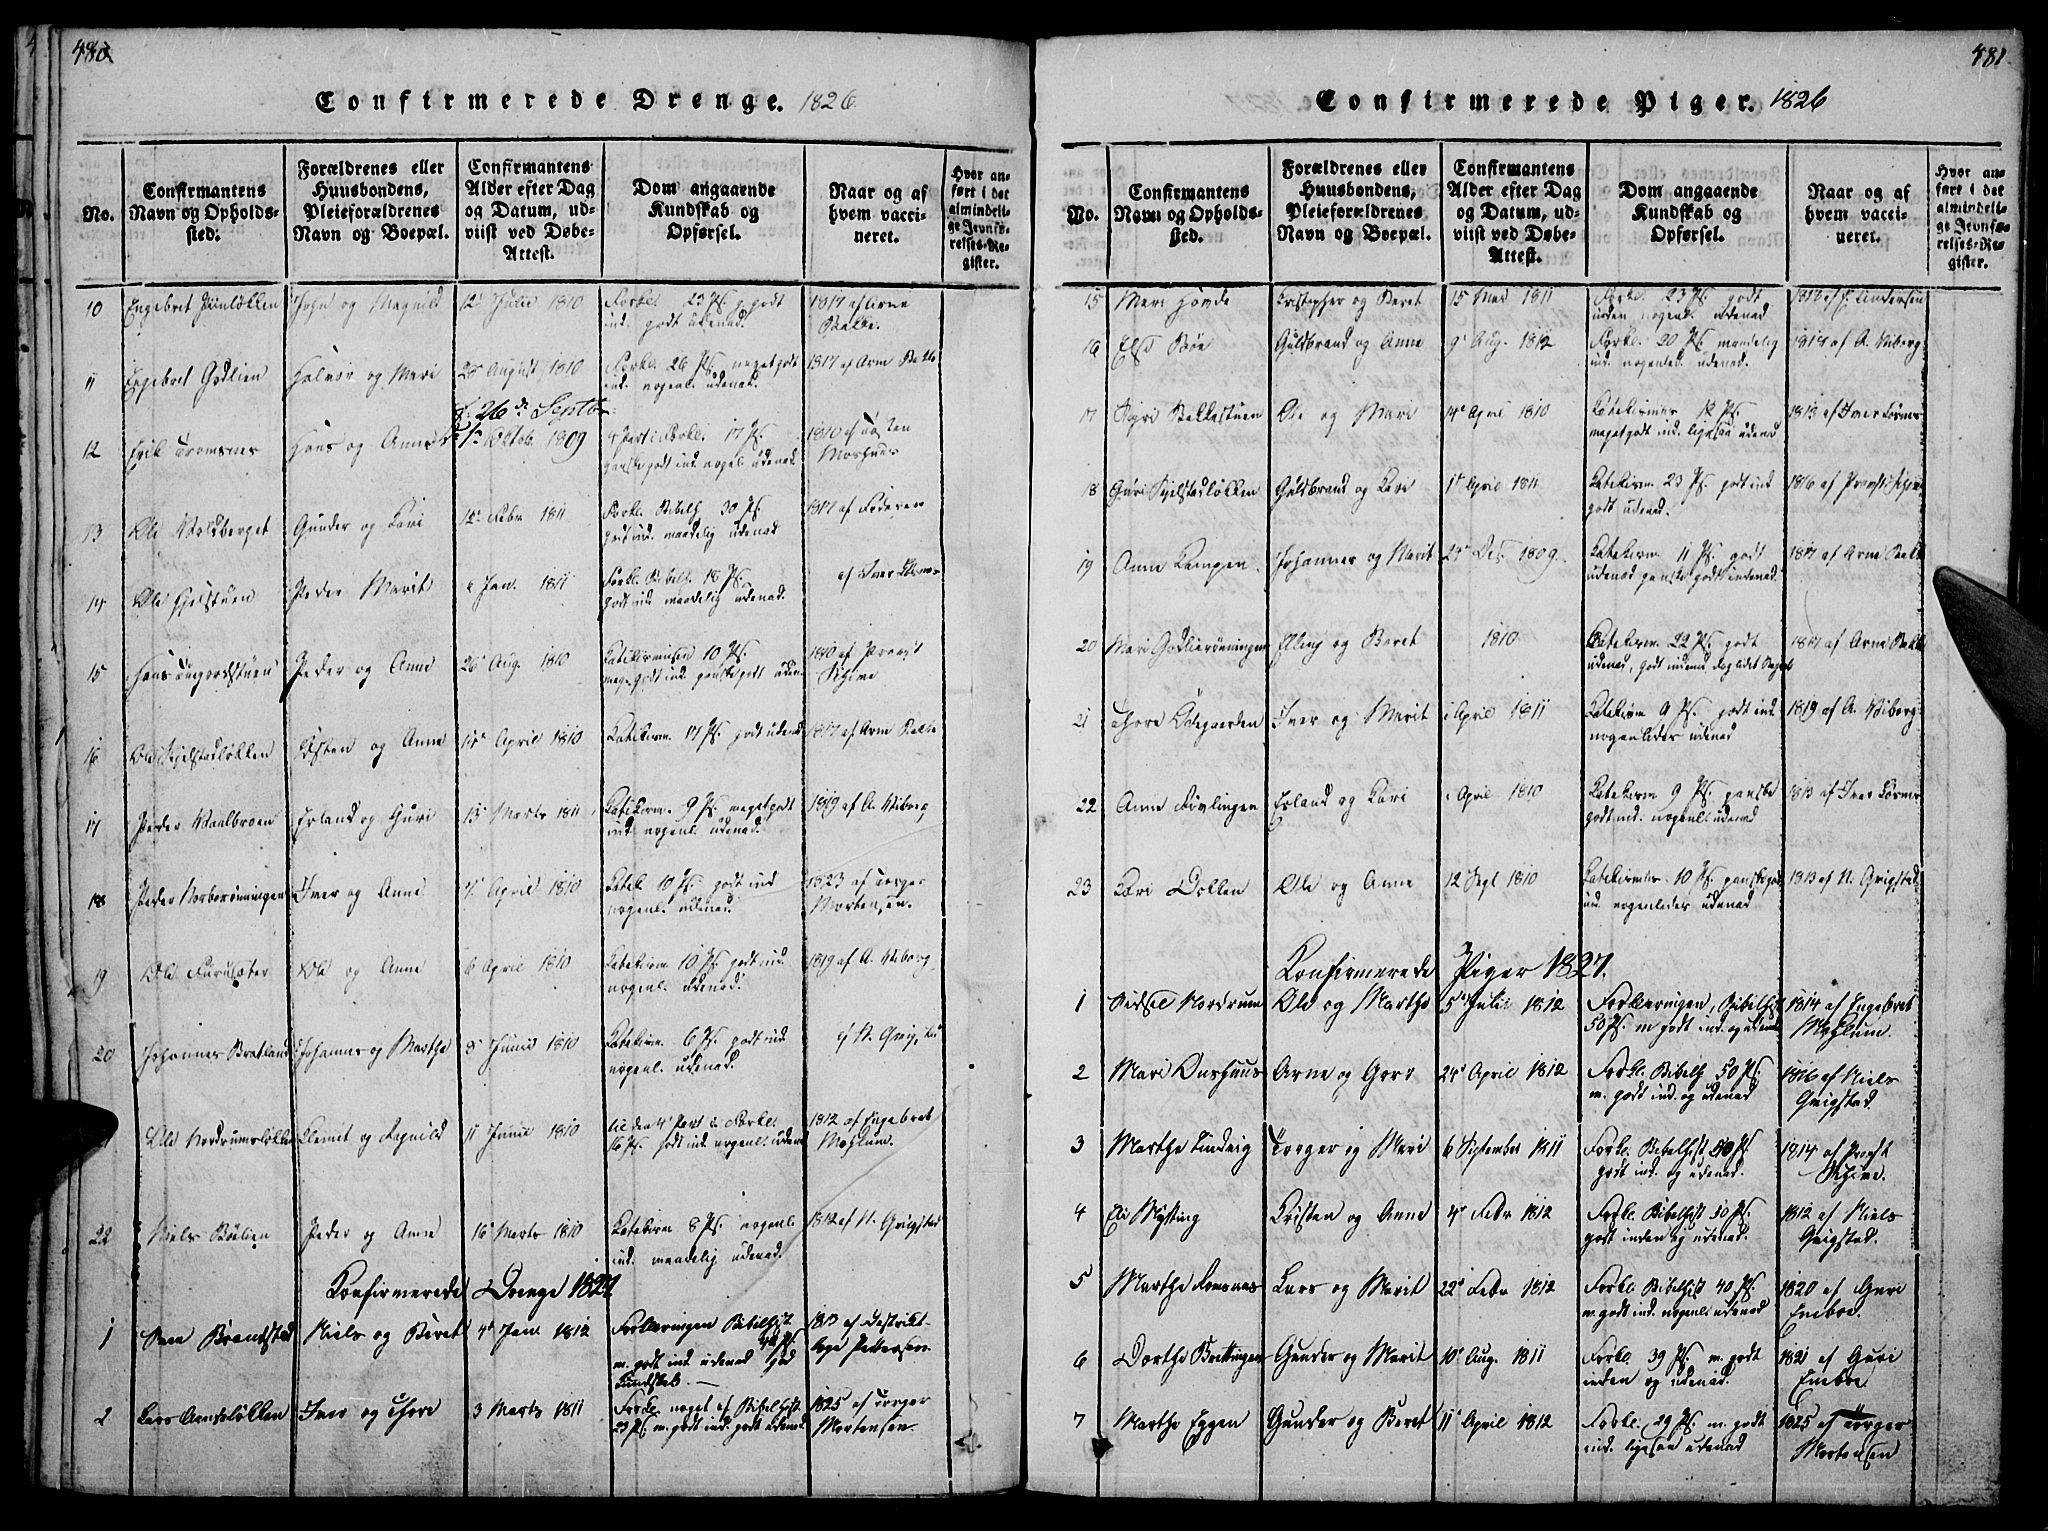 SAH, Ringebu prestekontor, Ministerialbok nr. 4, 1821-1839, s. 480-481